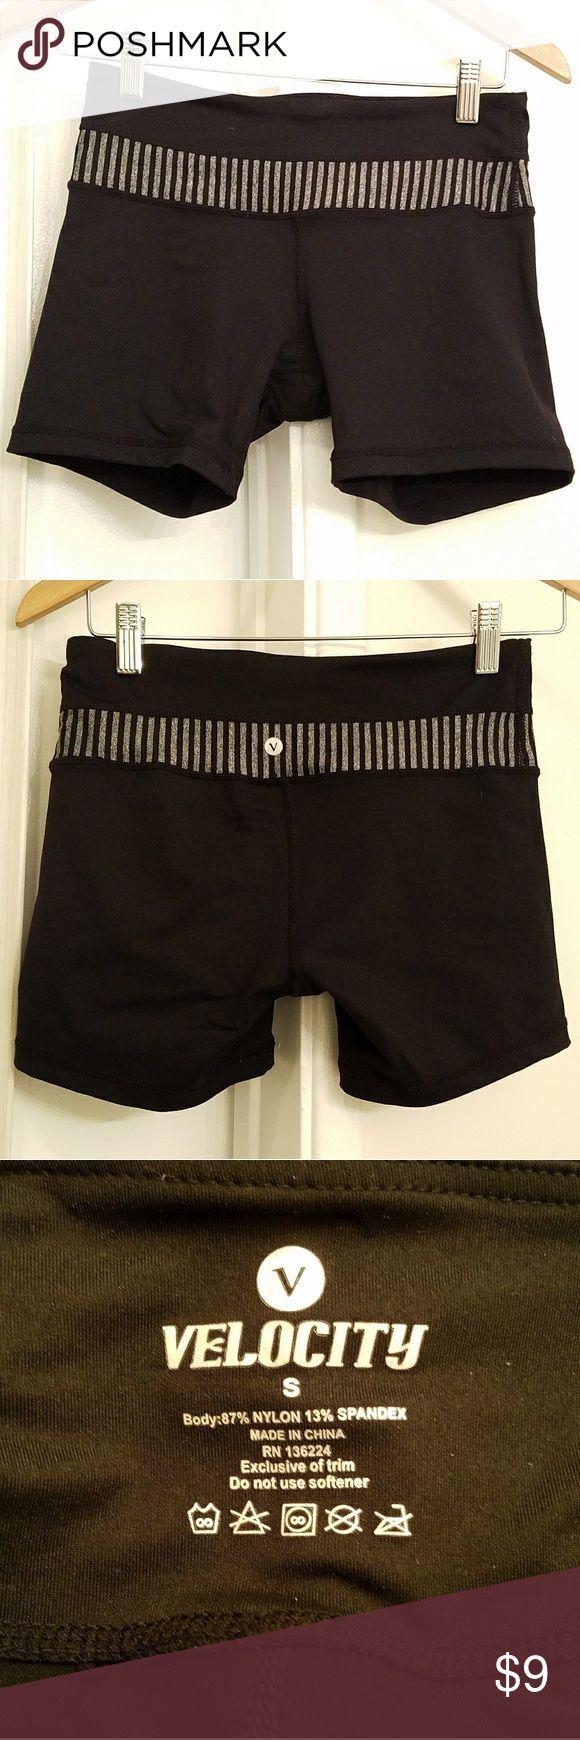 Velocity Black Spandex Biker Running Shorts In excellent condition, like new! On…   – Biker Shorts